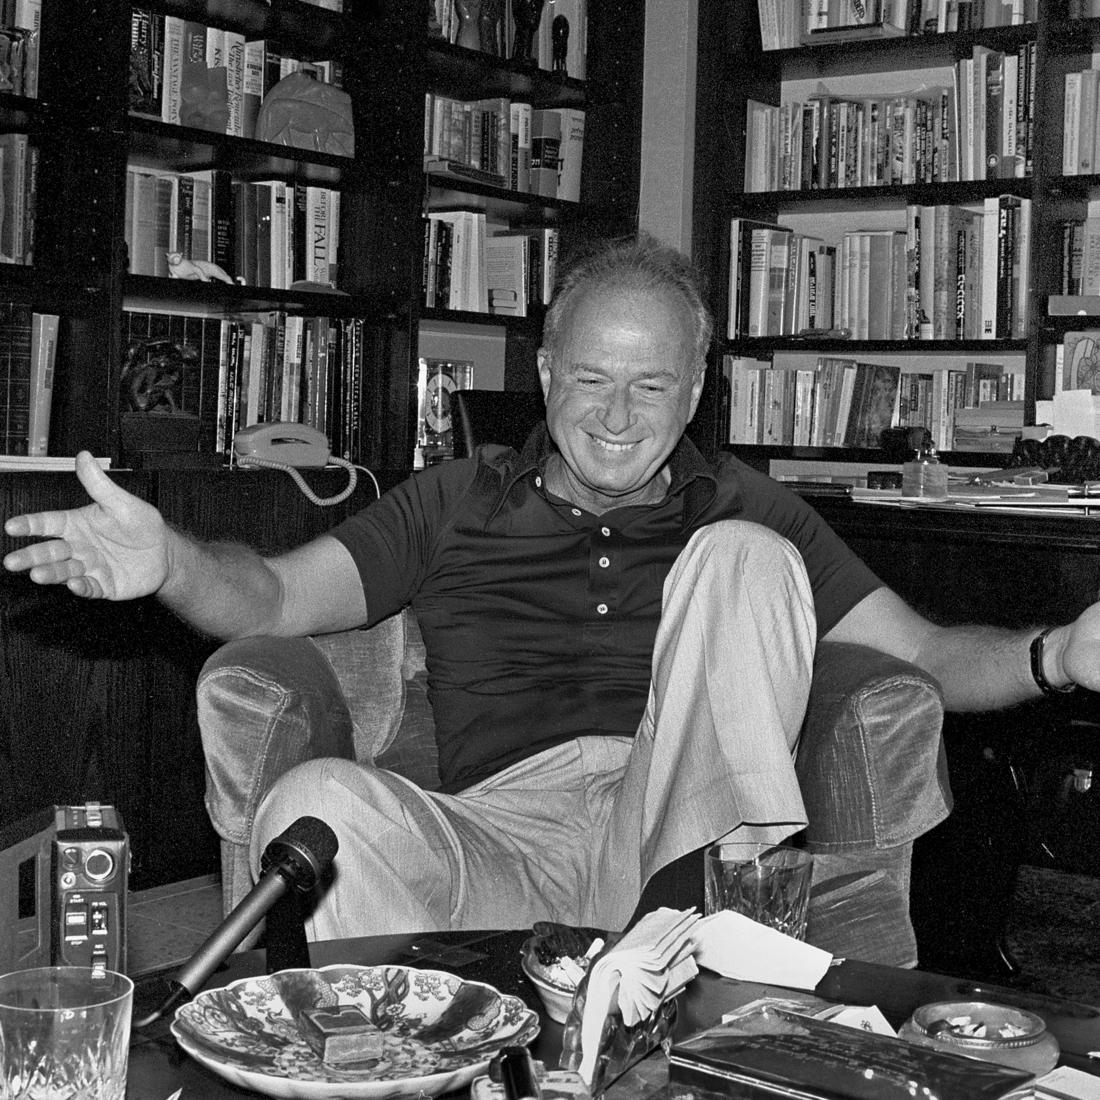 Rabin at his home in Ramat Aviv (Photo: David Rubinger)